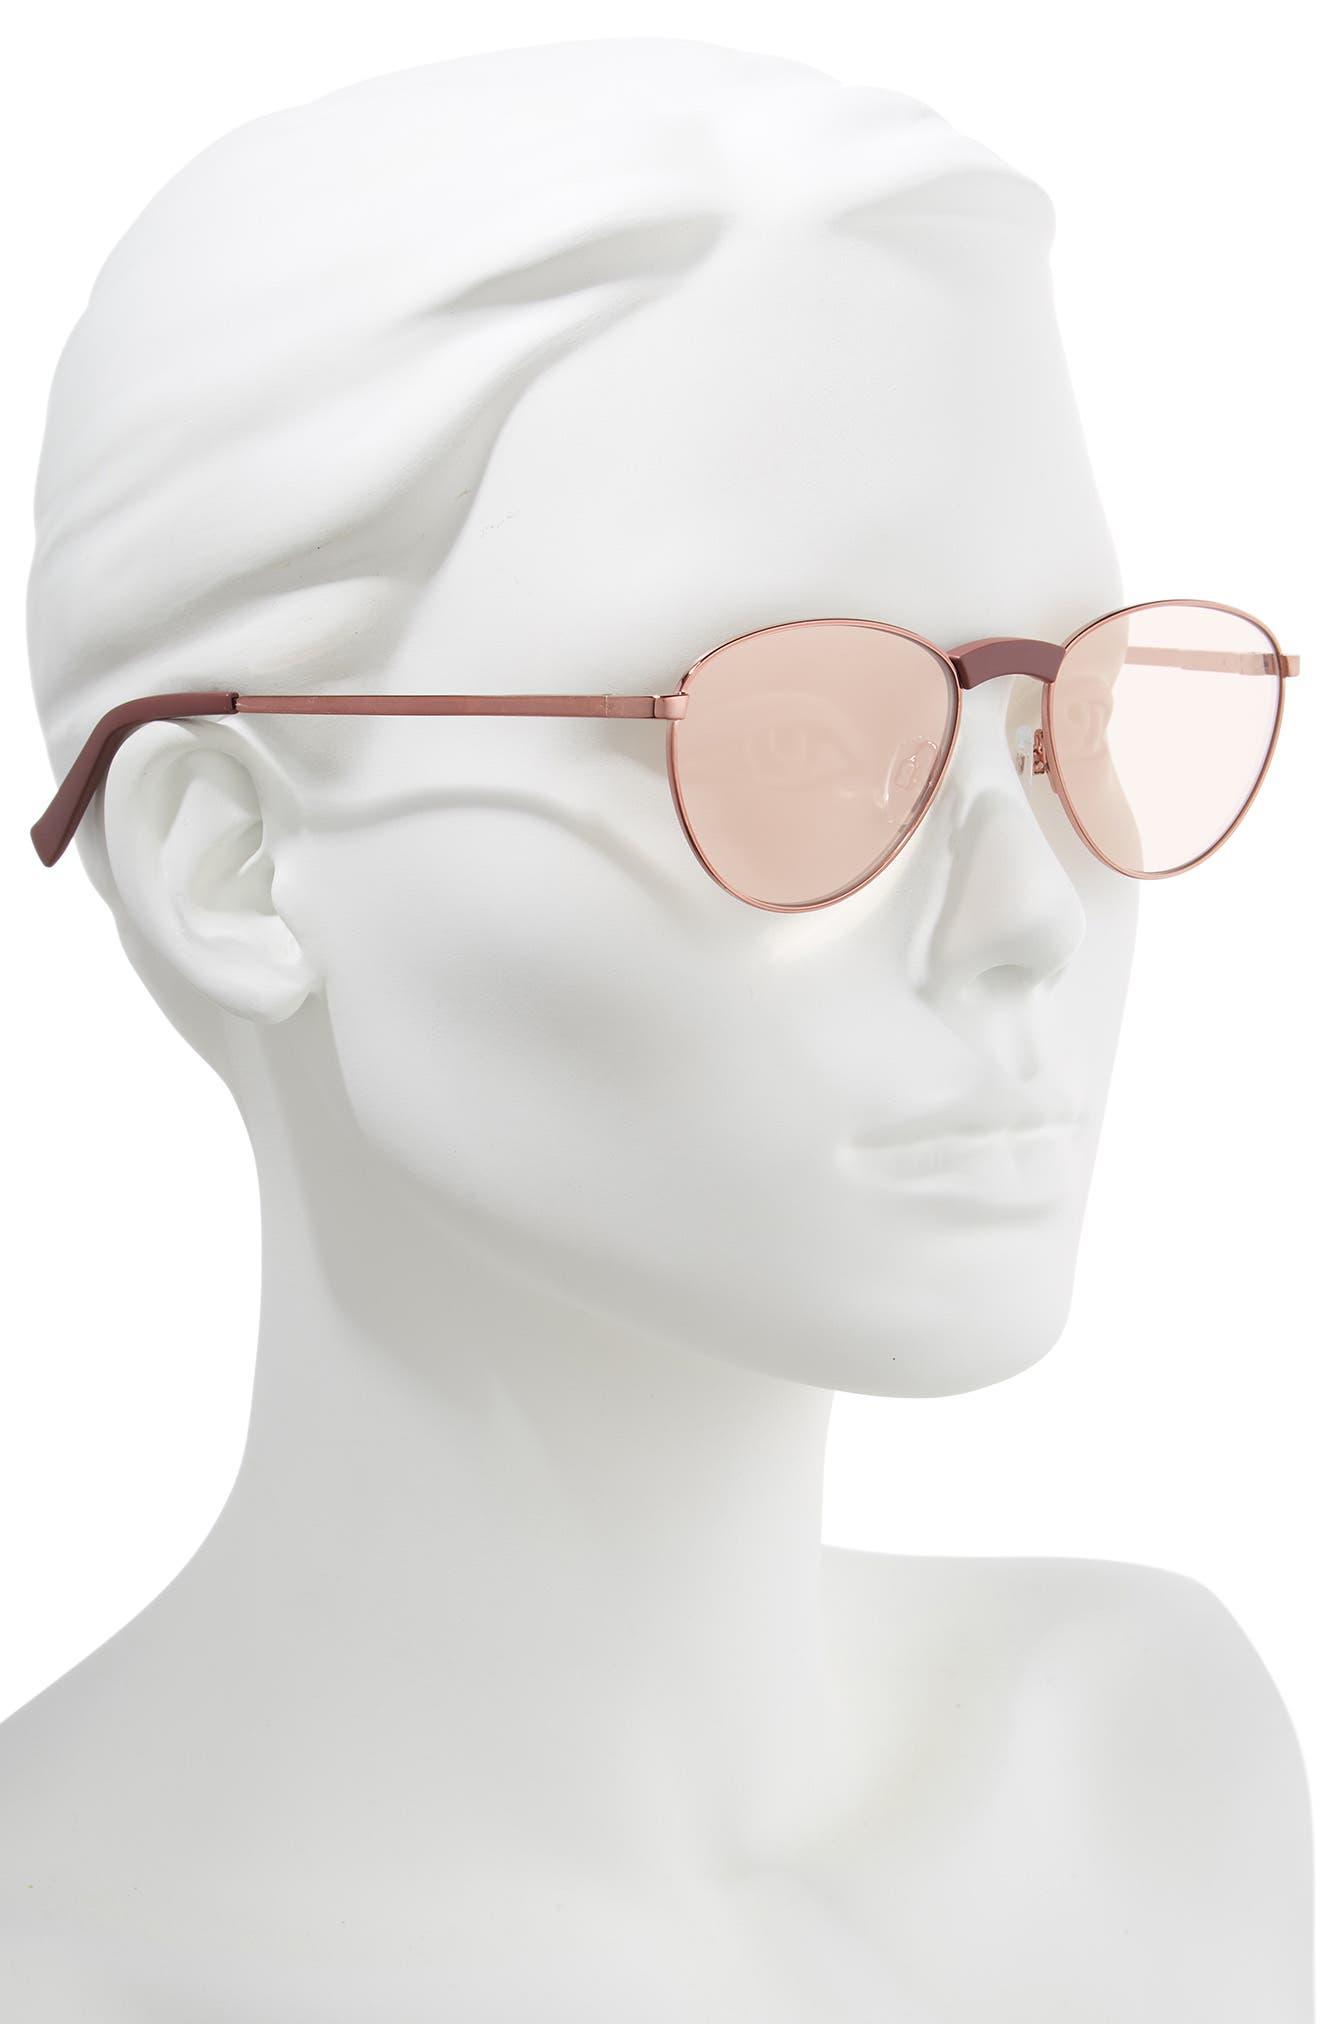 Hot Stuff 52mm Sunglasses,                             Alternate thumbnail 2, color,                             200